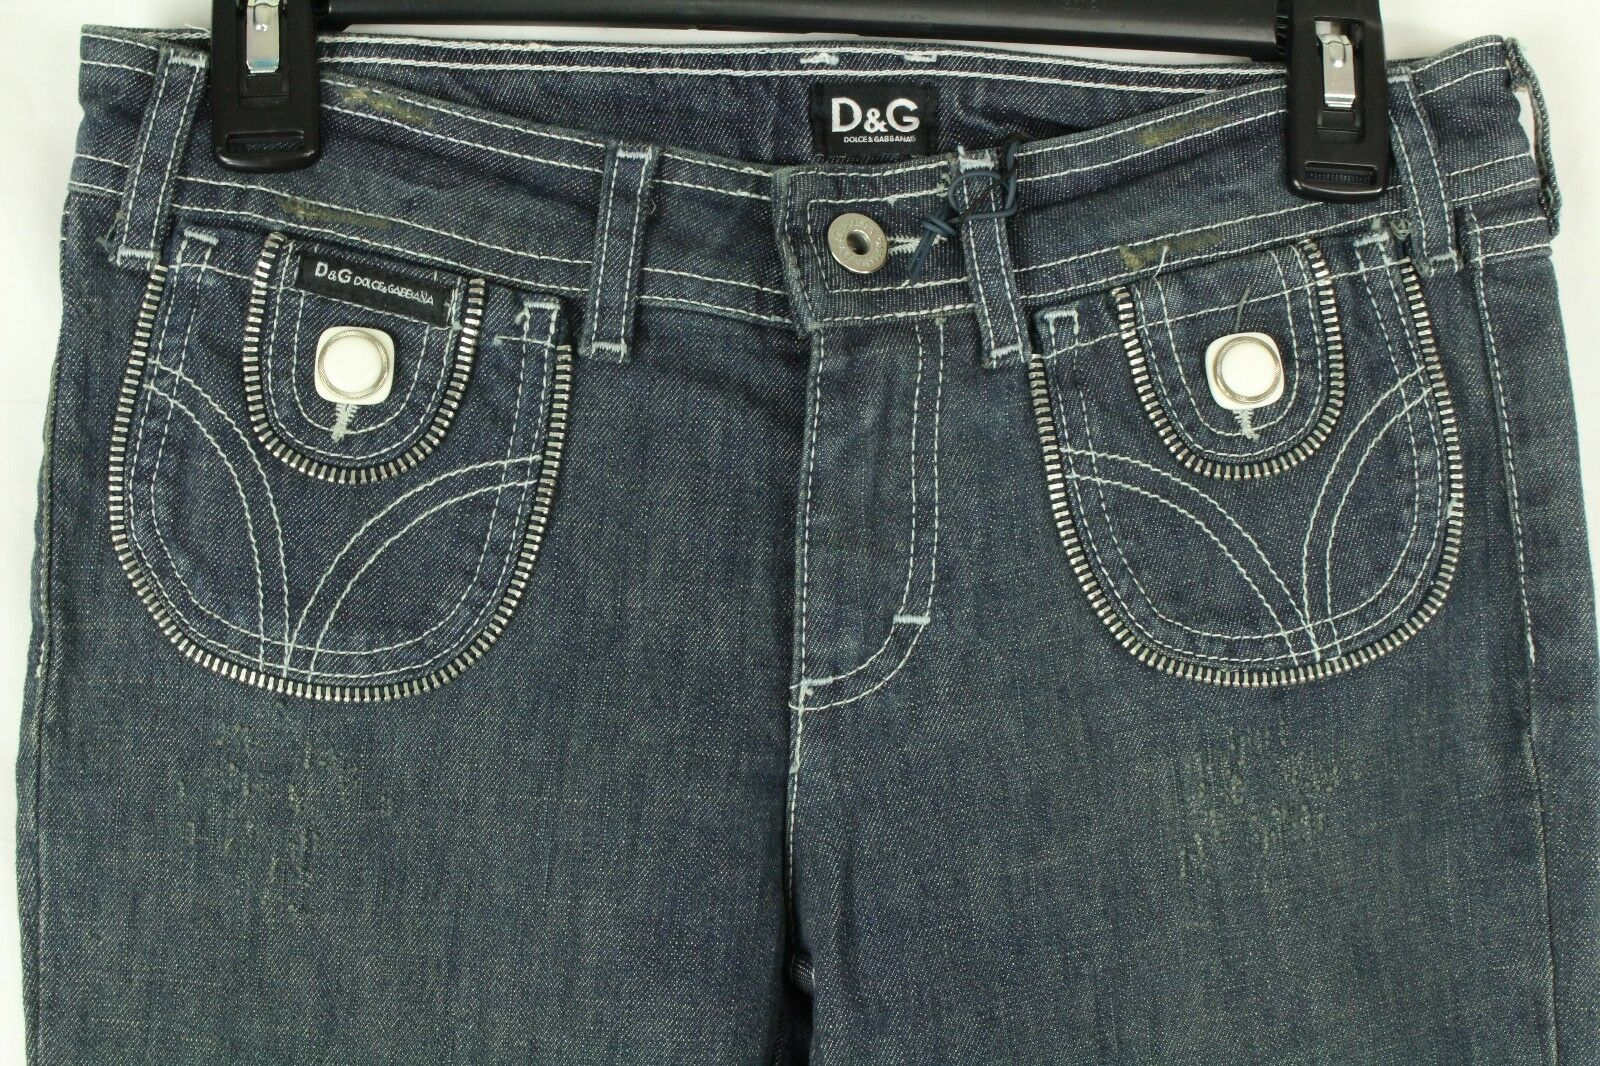 Dolce & Gabbana Love Affair Damen Jeans mit Distressed Skinny Stretch Größe